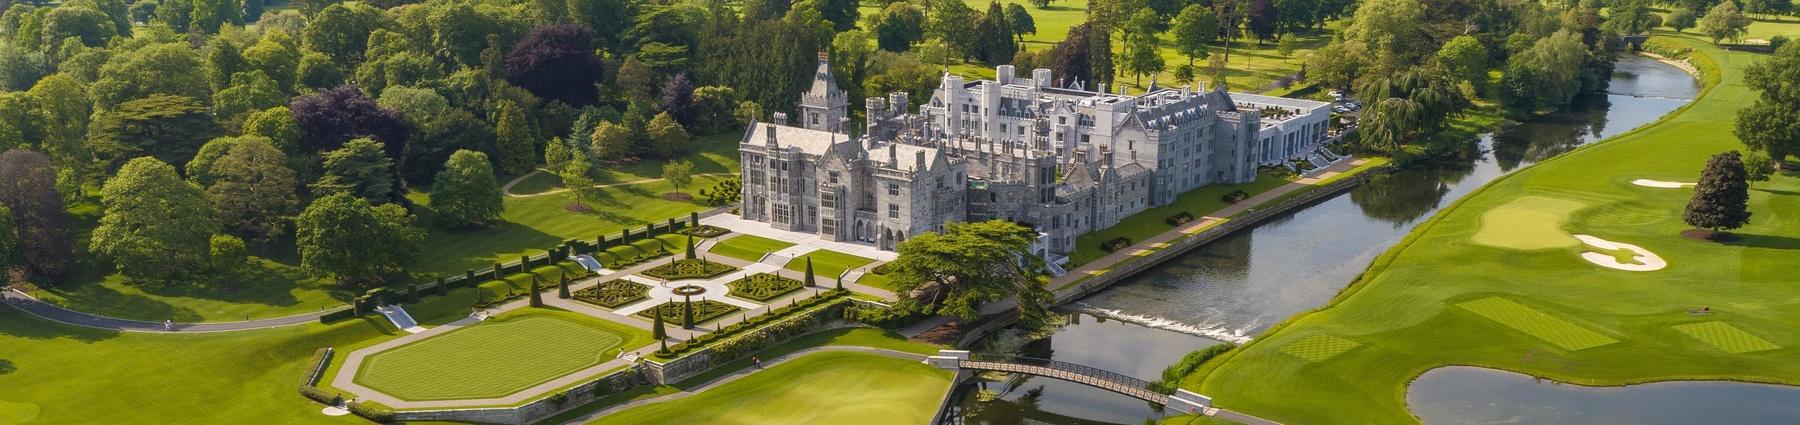 Adare Manor cropAerial Image